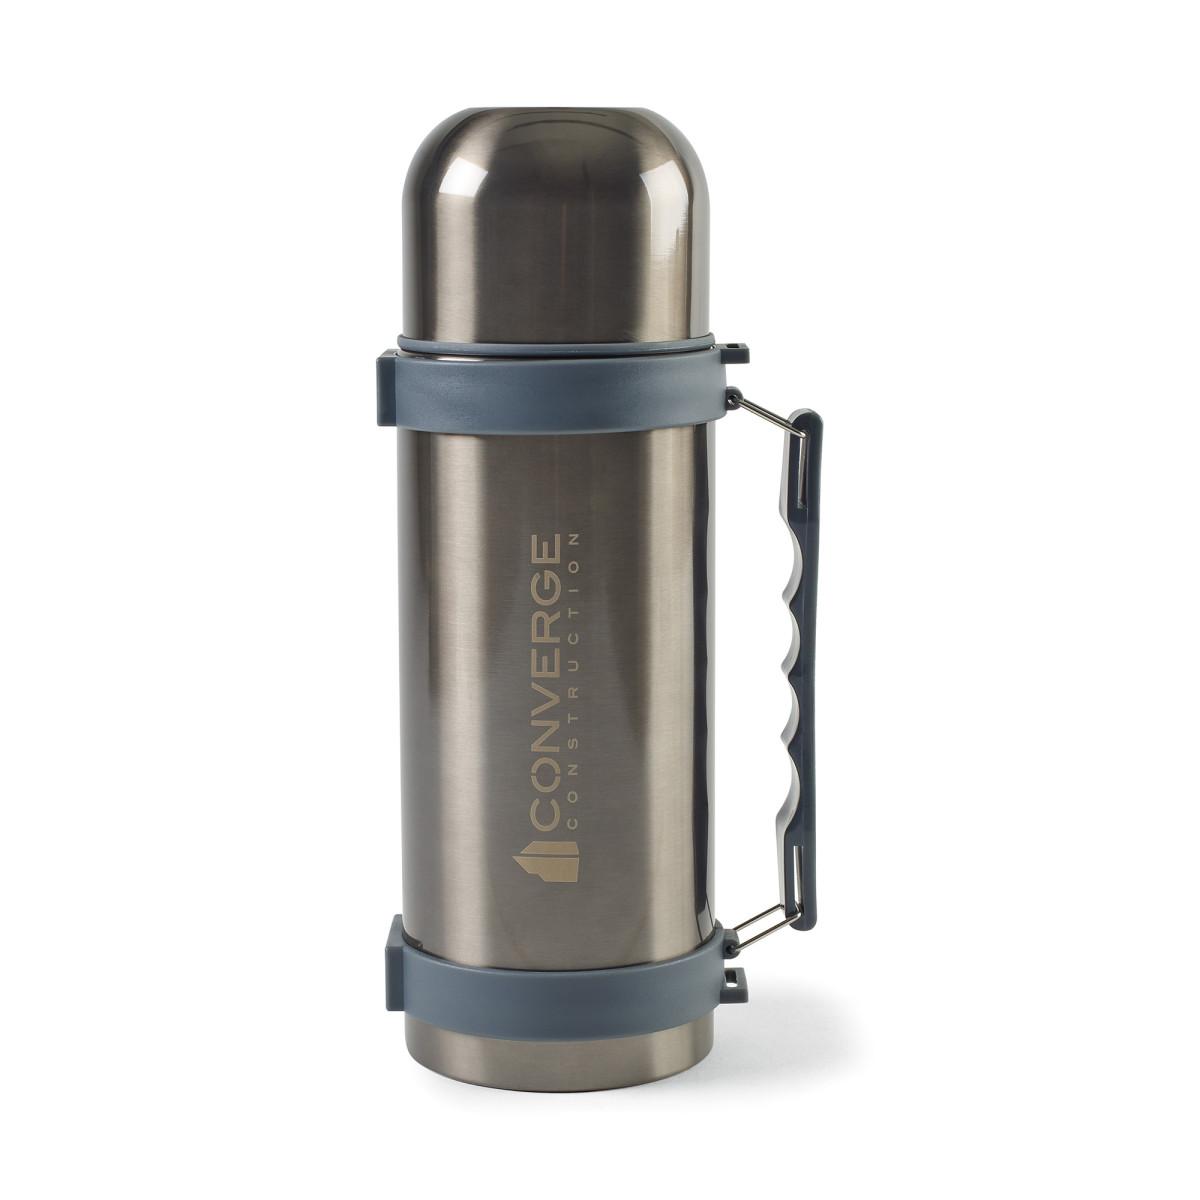 Aviana™Fallon Double Wall Stainless Beverage Bottle - 34 Oz. Grey-Black